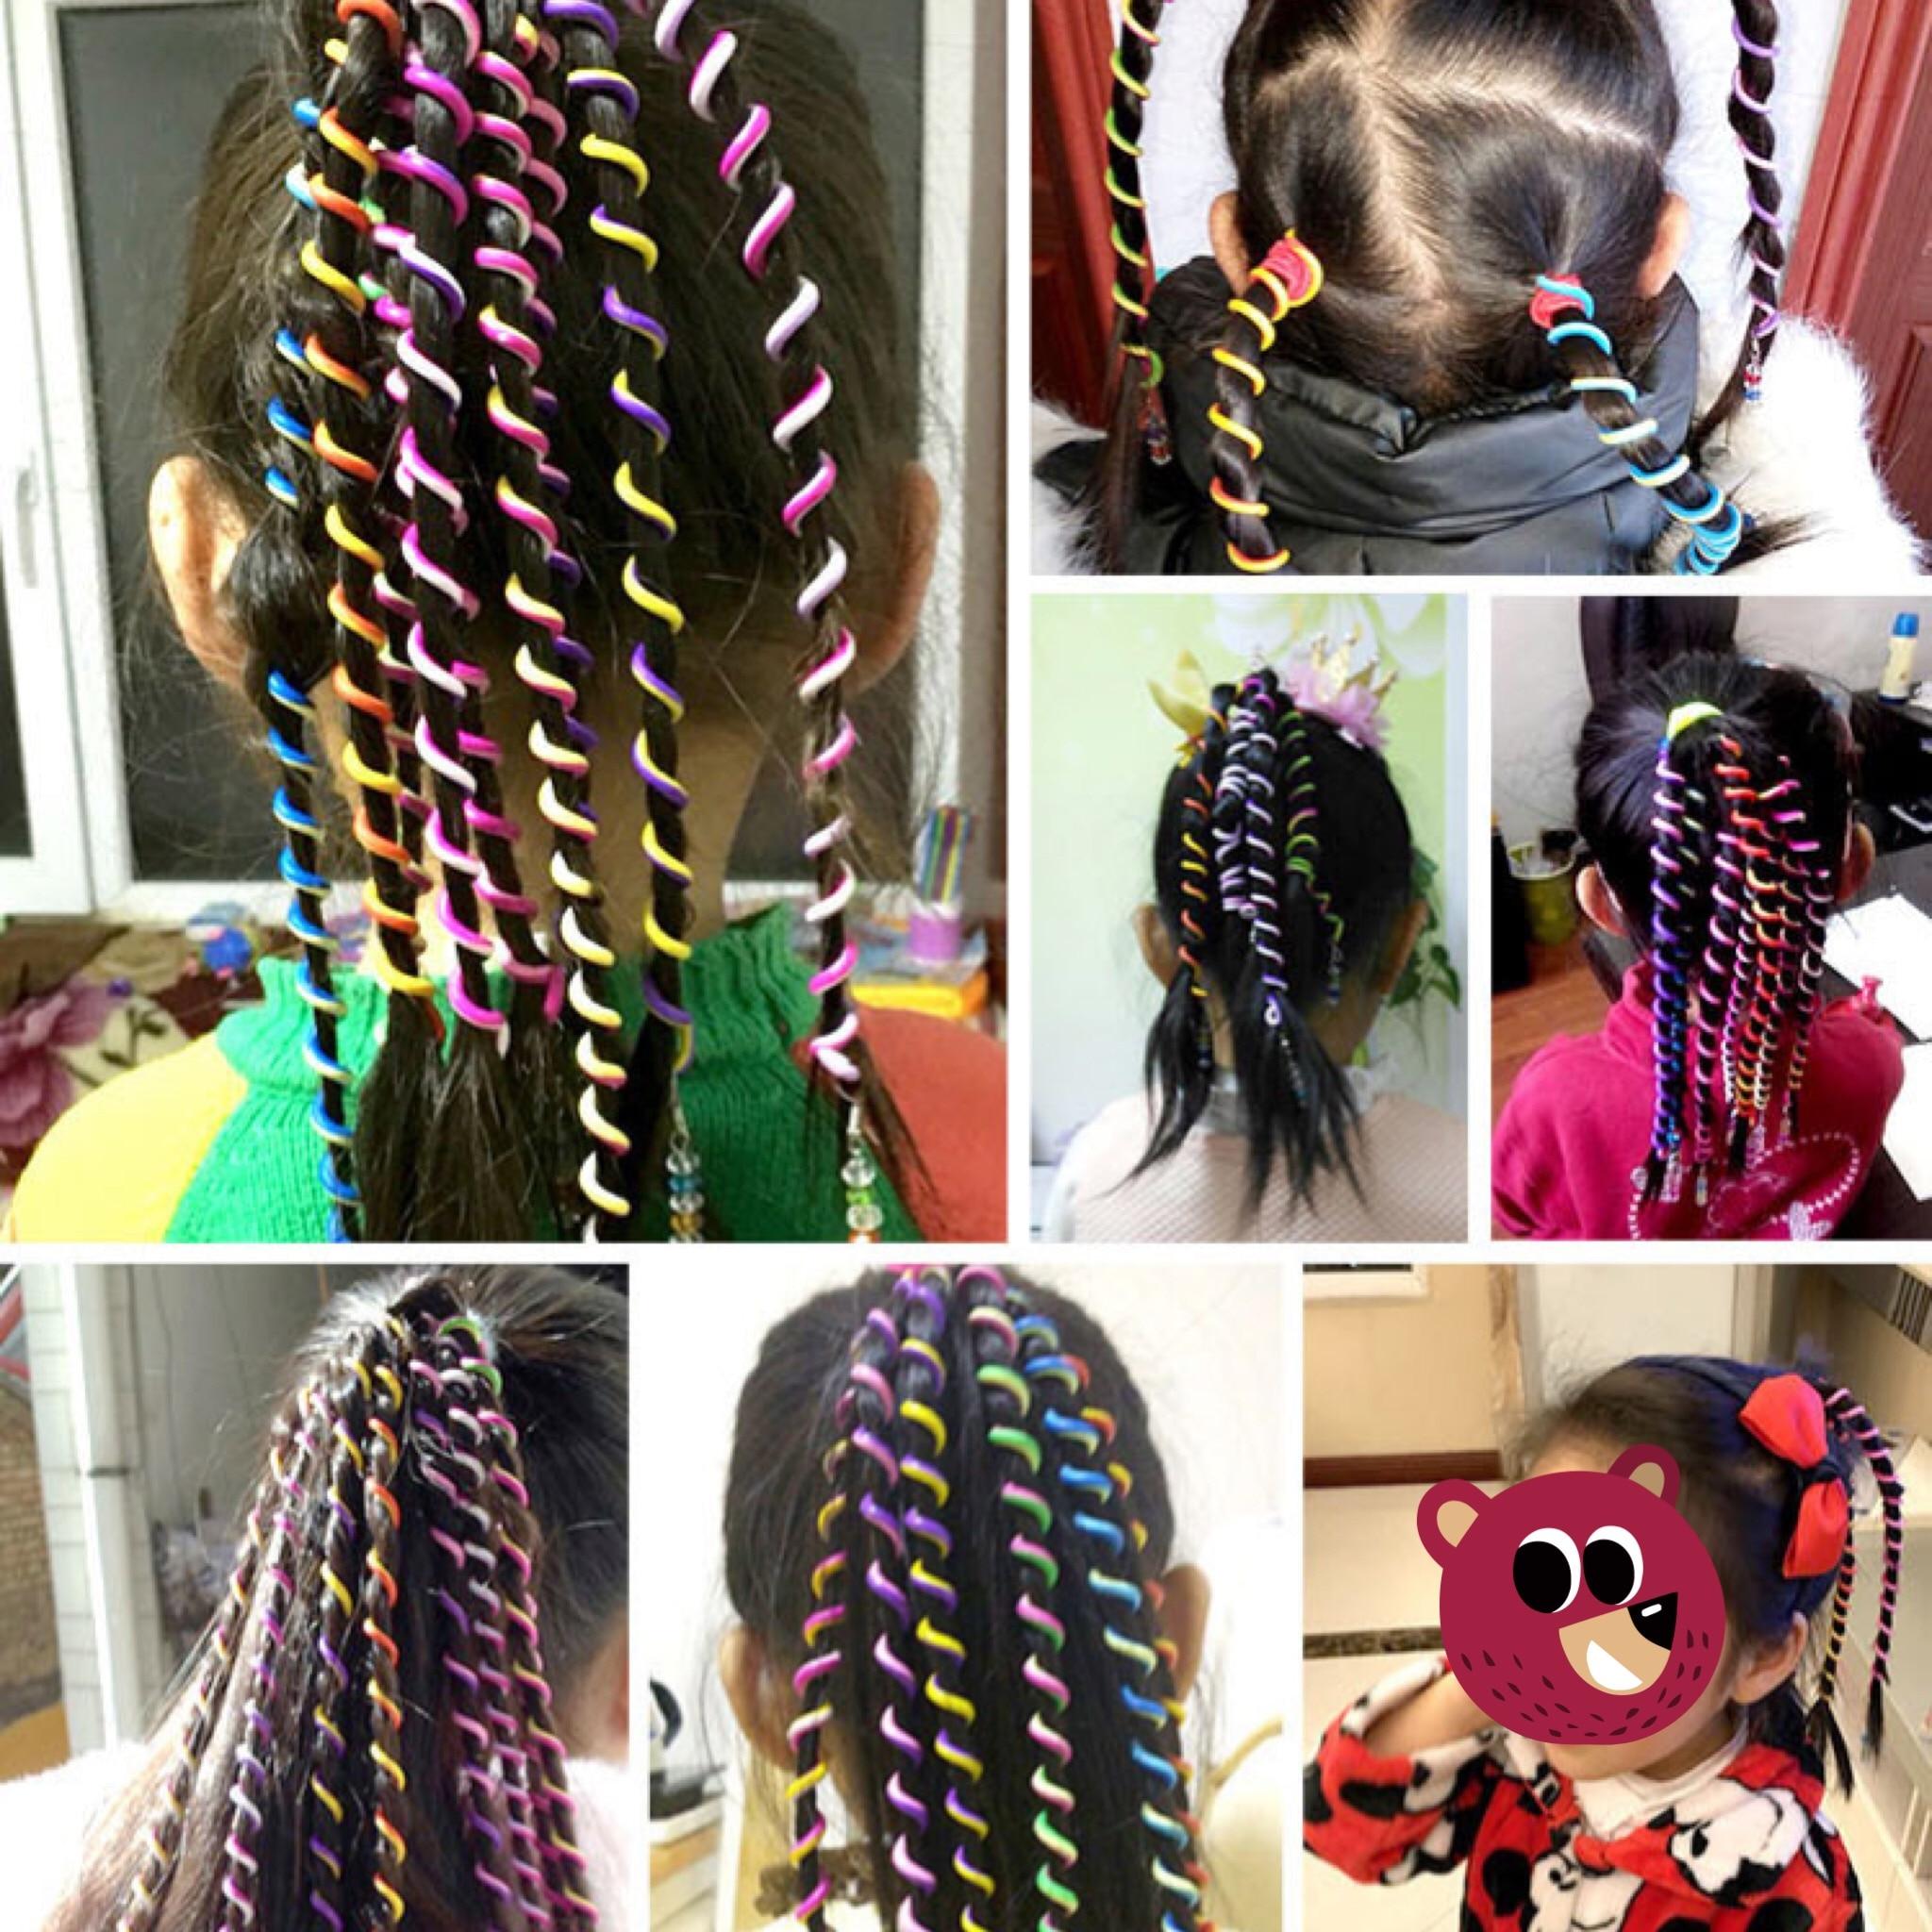 6pcs/lot Headband Cute Girls Hair Band Crystal Long Elastic Headwear Rainbow Color Free Length Dreadlocks Hair Style Accessories